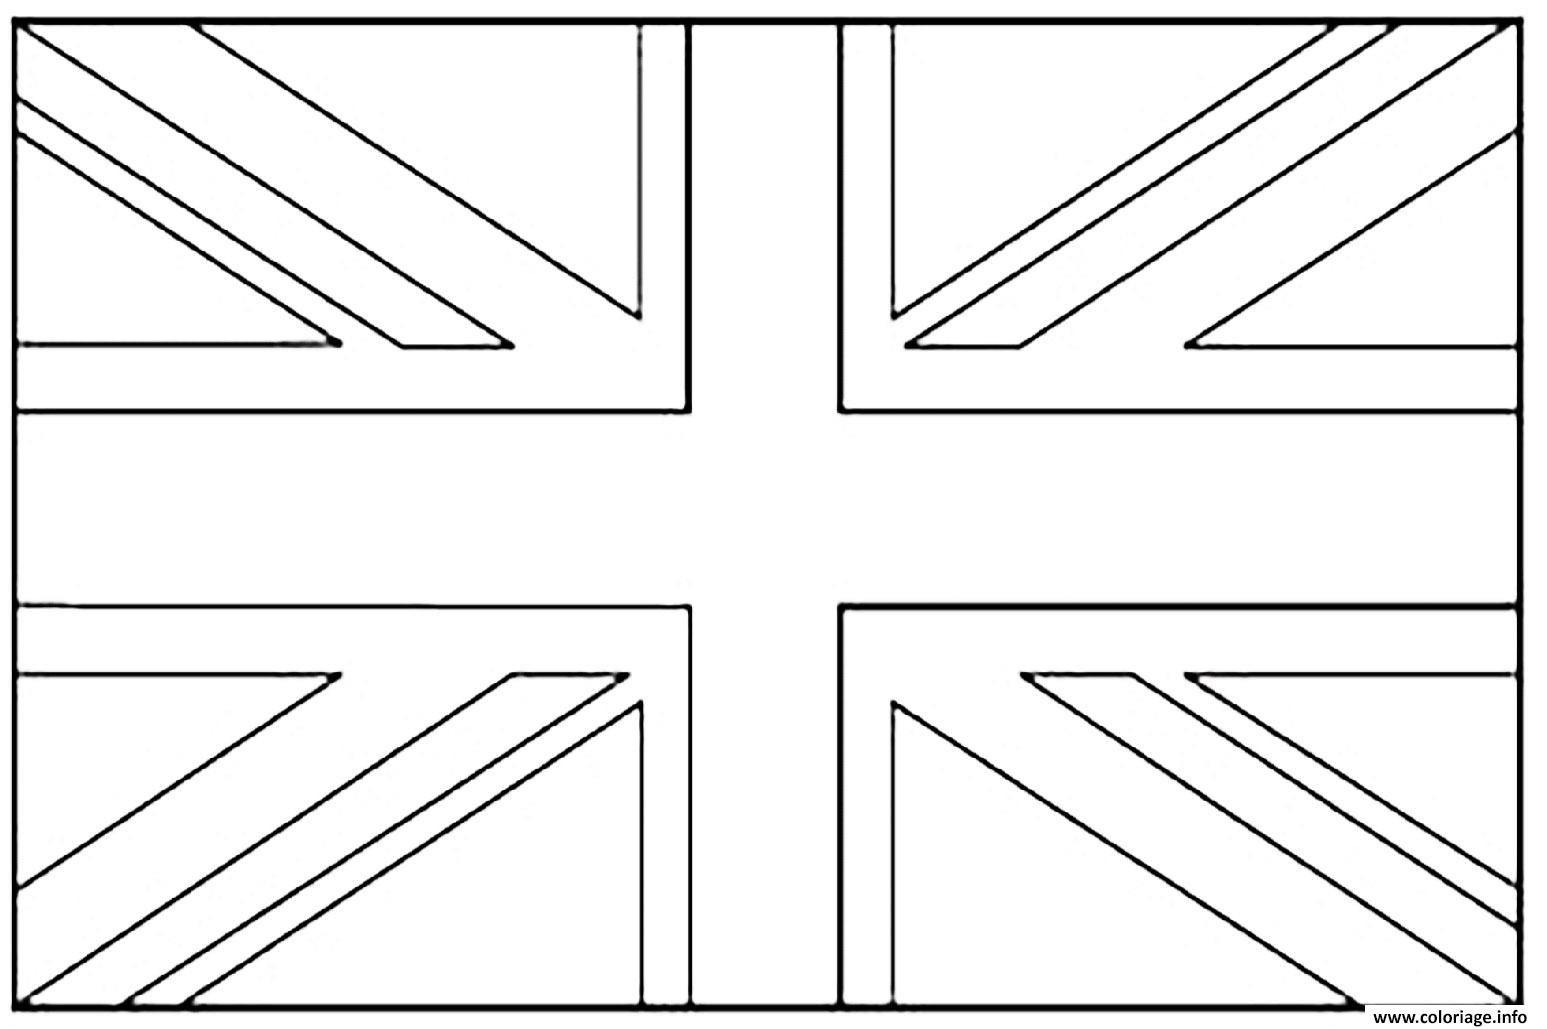 Coloriage Drapeau Angleterre Jecolorie | Drapeau, Modèle De serapportantà Dessin De Angleterre